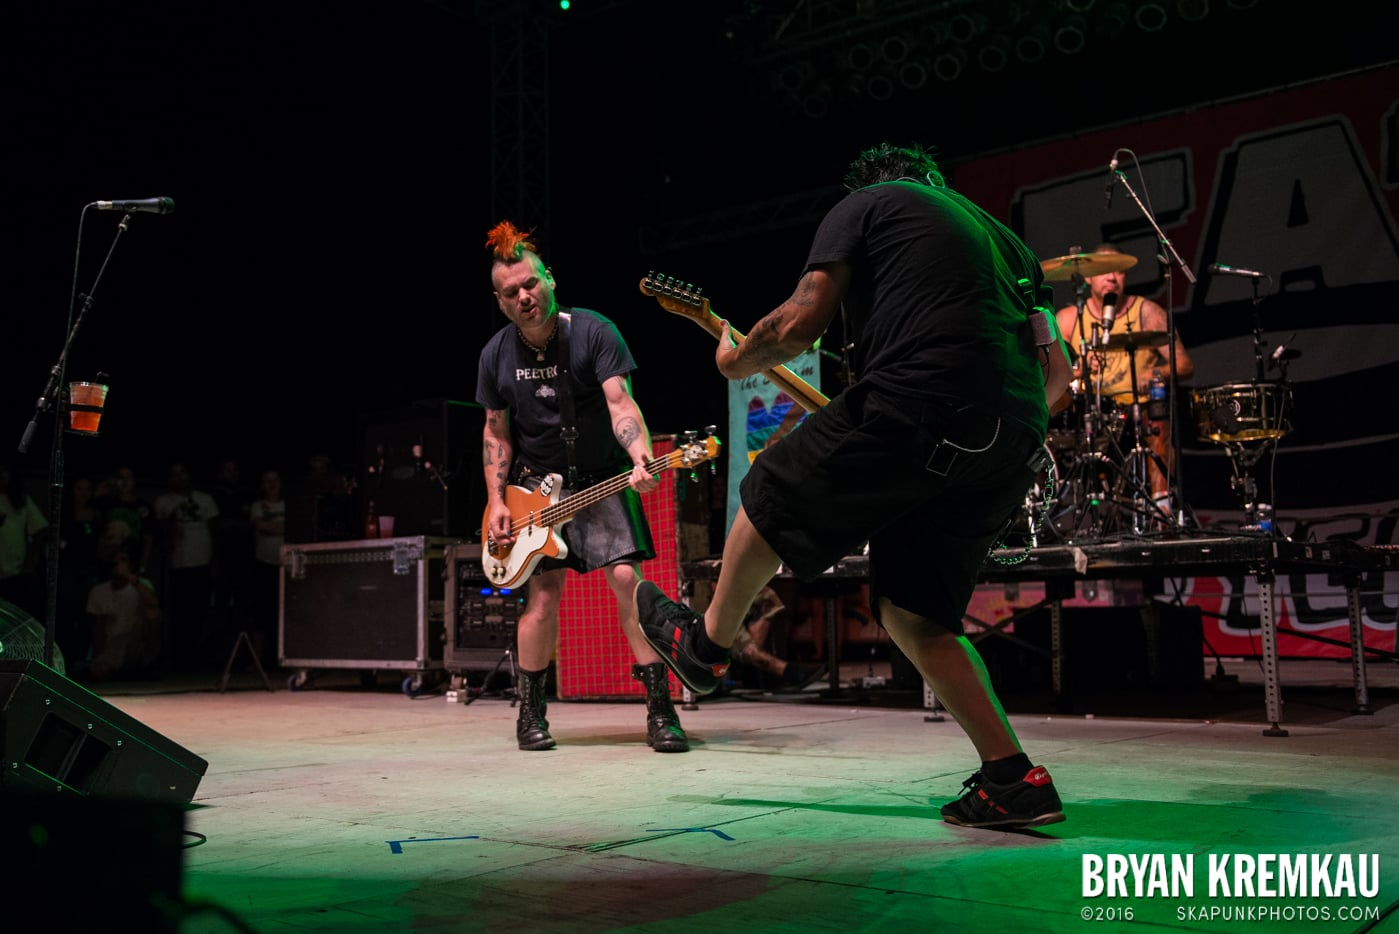 NOFX @ Stone Pony Summer Stage, Asbury Park, NJ - 8.15.15 (18)